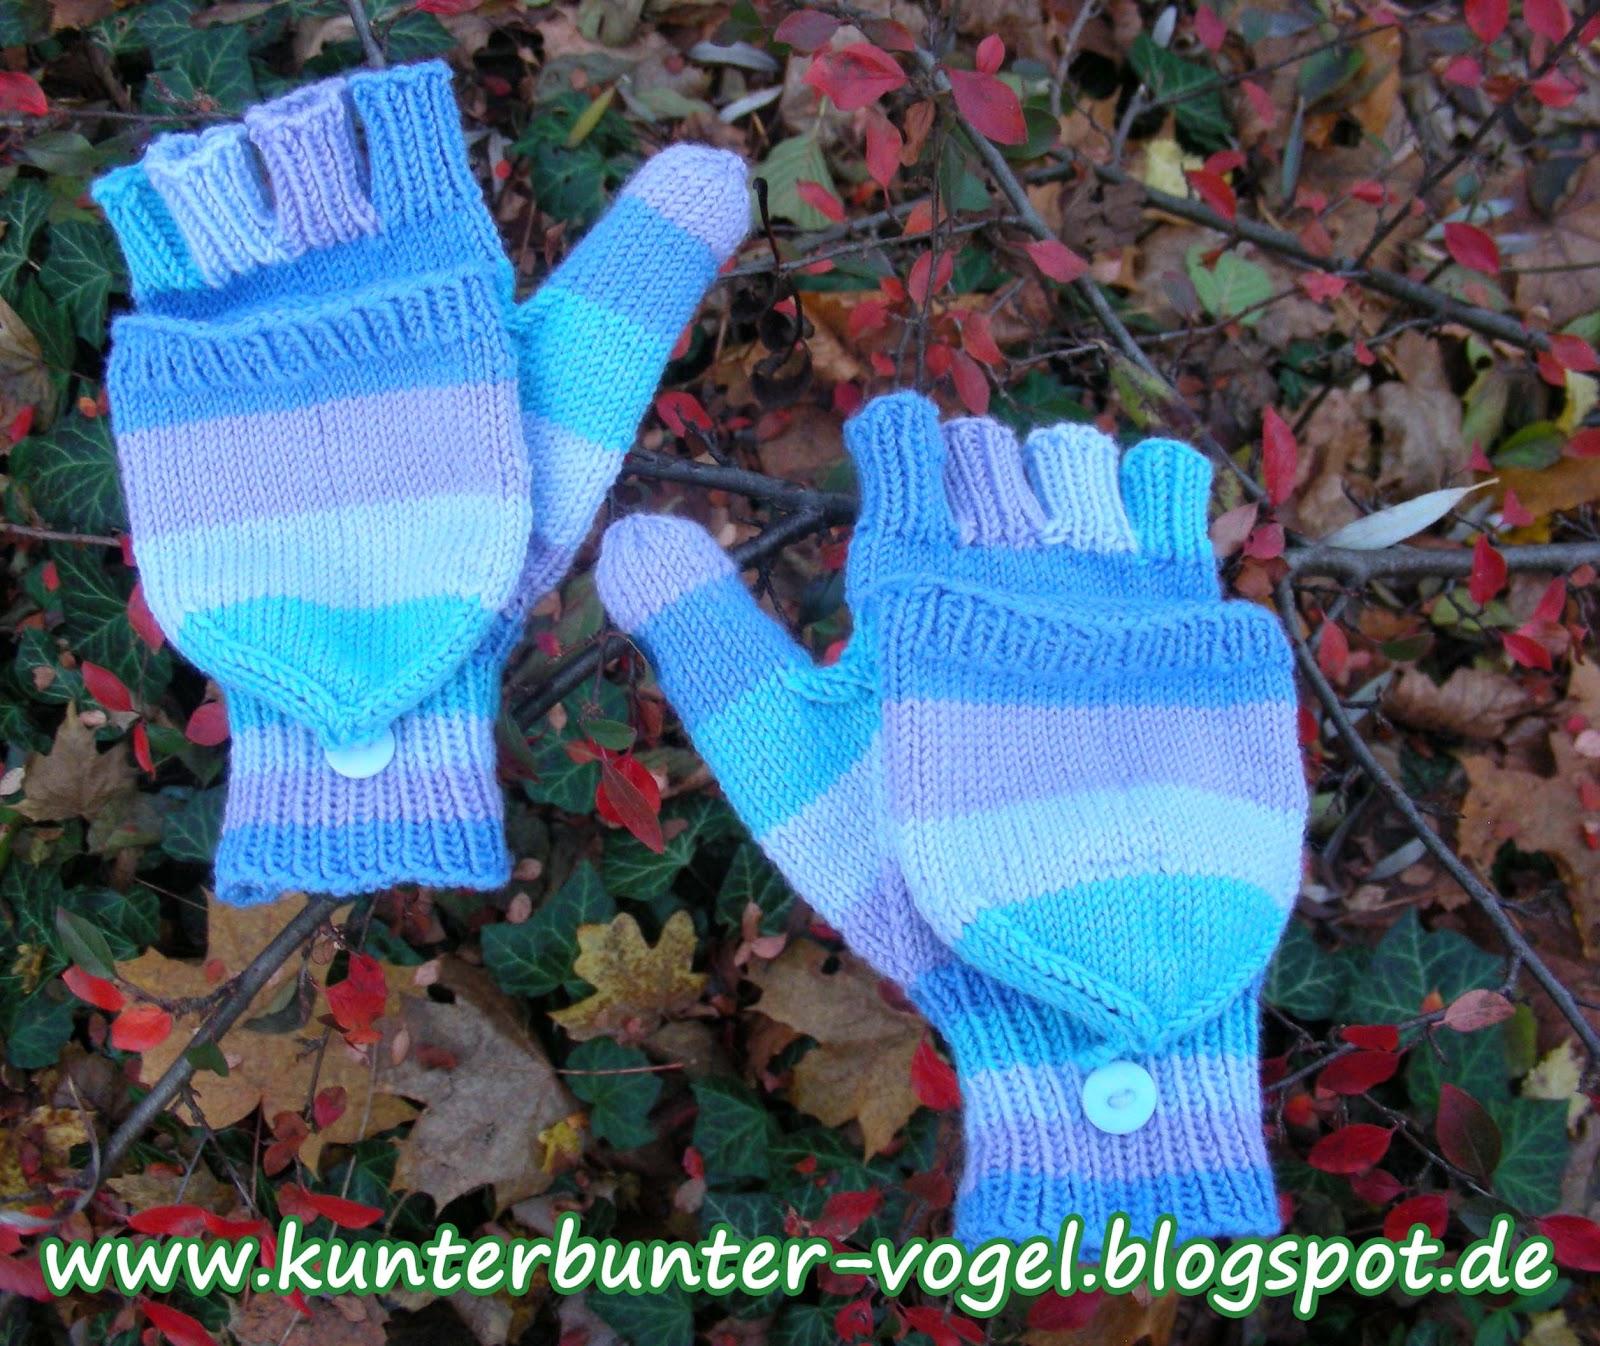 Kunterbunter Vogel Anleitung Handschuhe Mit Fingerkappe Teil 1